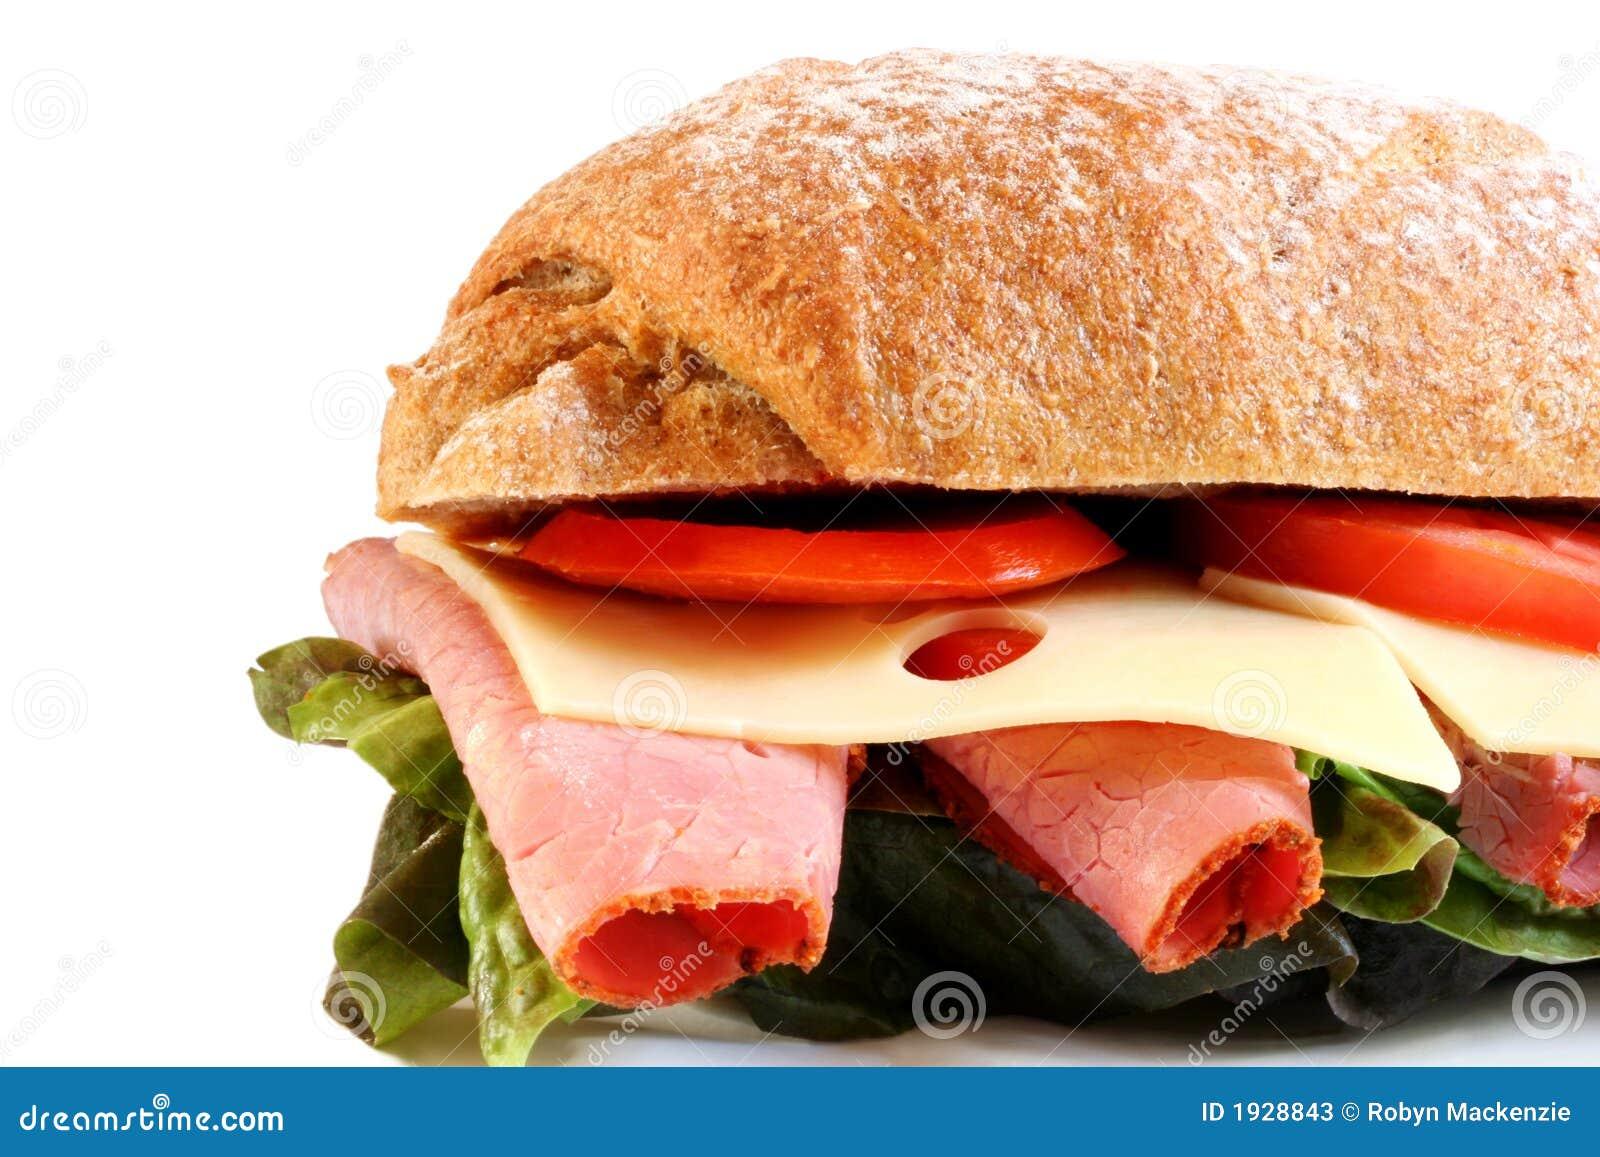 熟食店三明治